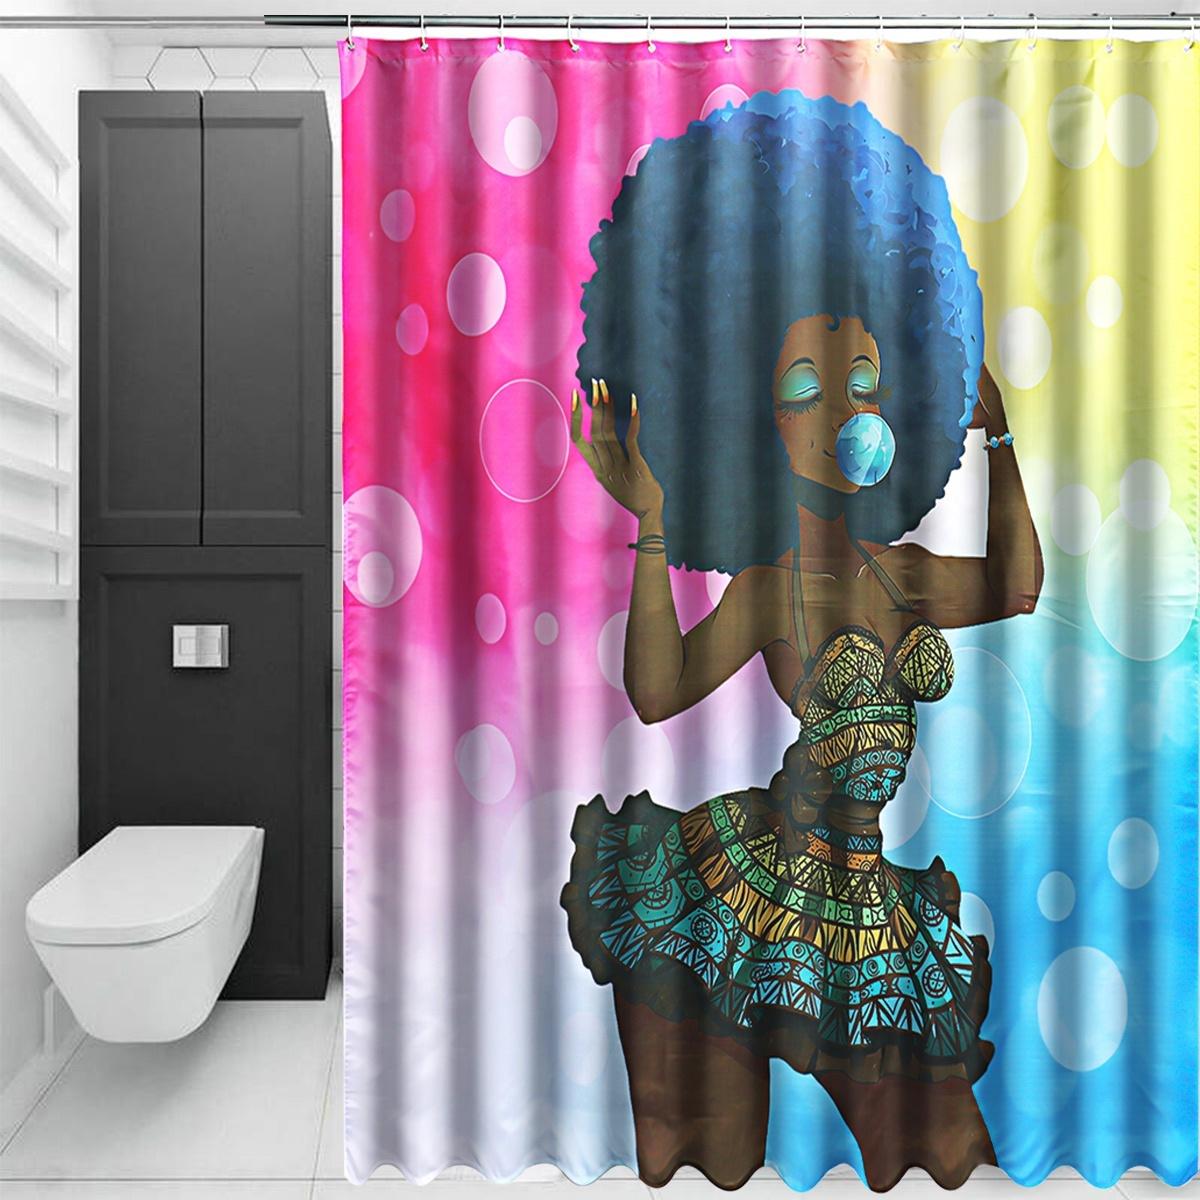 African Girl Bathroom Non-Slip Carpet Pedestal Rug+Lid Toilet Cover+Bath Mat